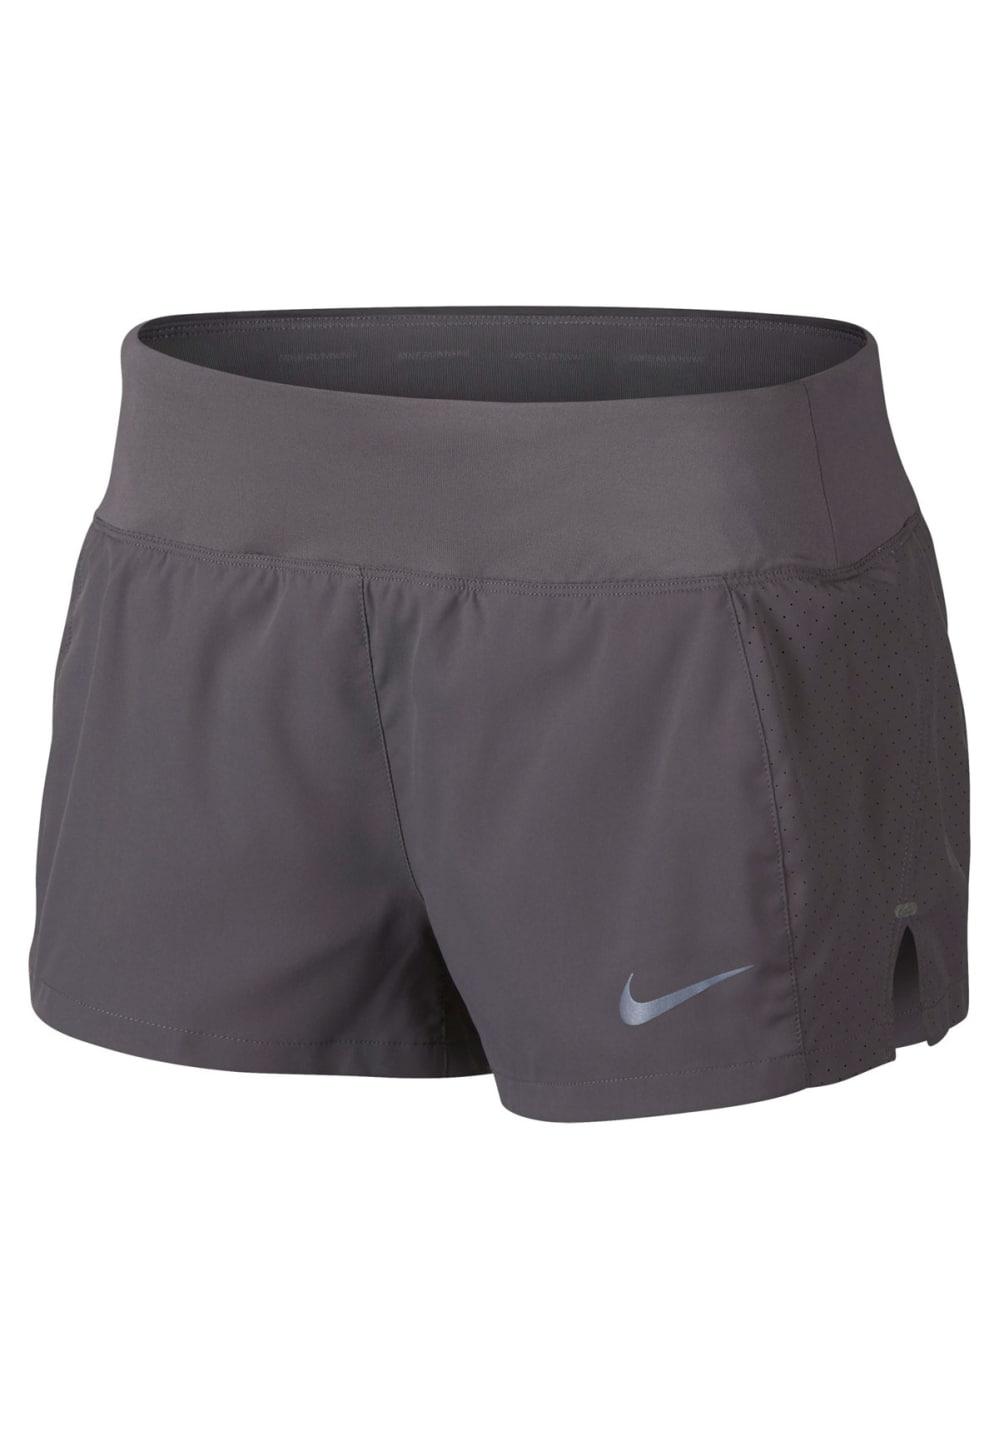 on sale 3d9d0 b8f13 ... Nike Eclipse 3